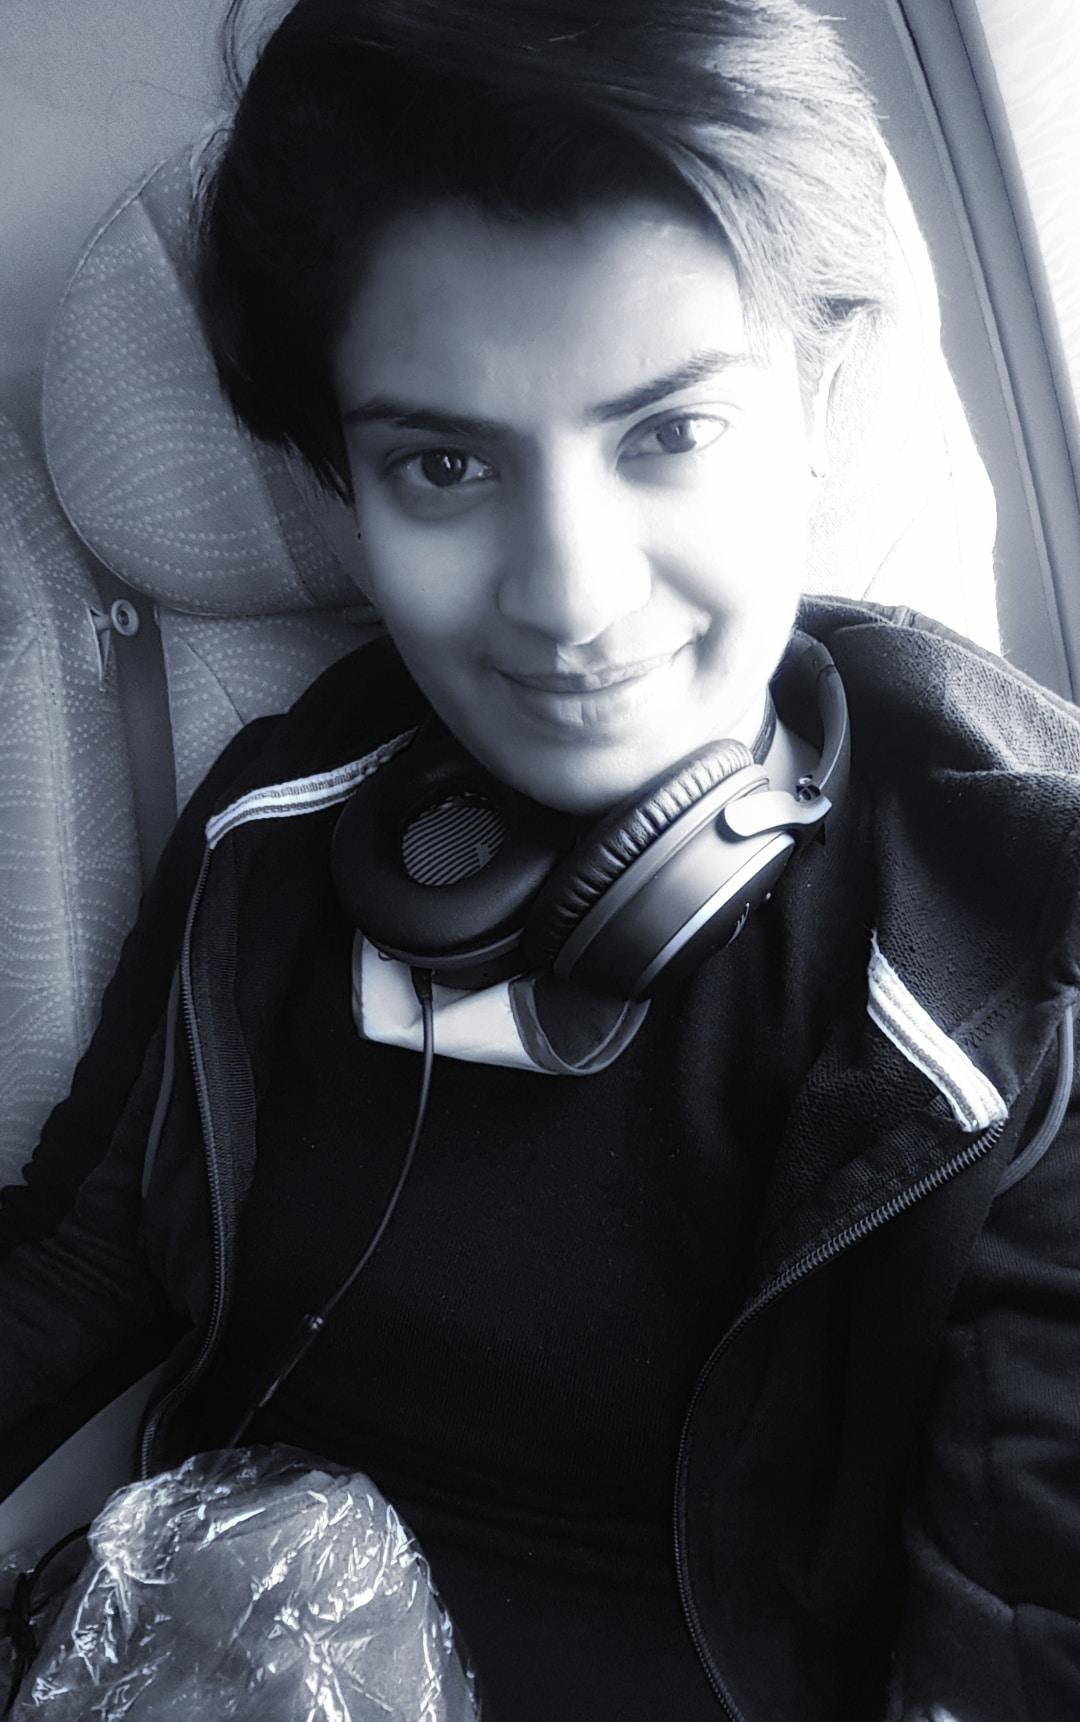 Go to AMRITA GHANTY's profile